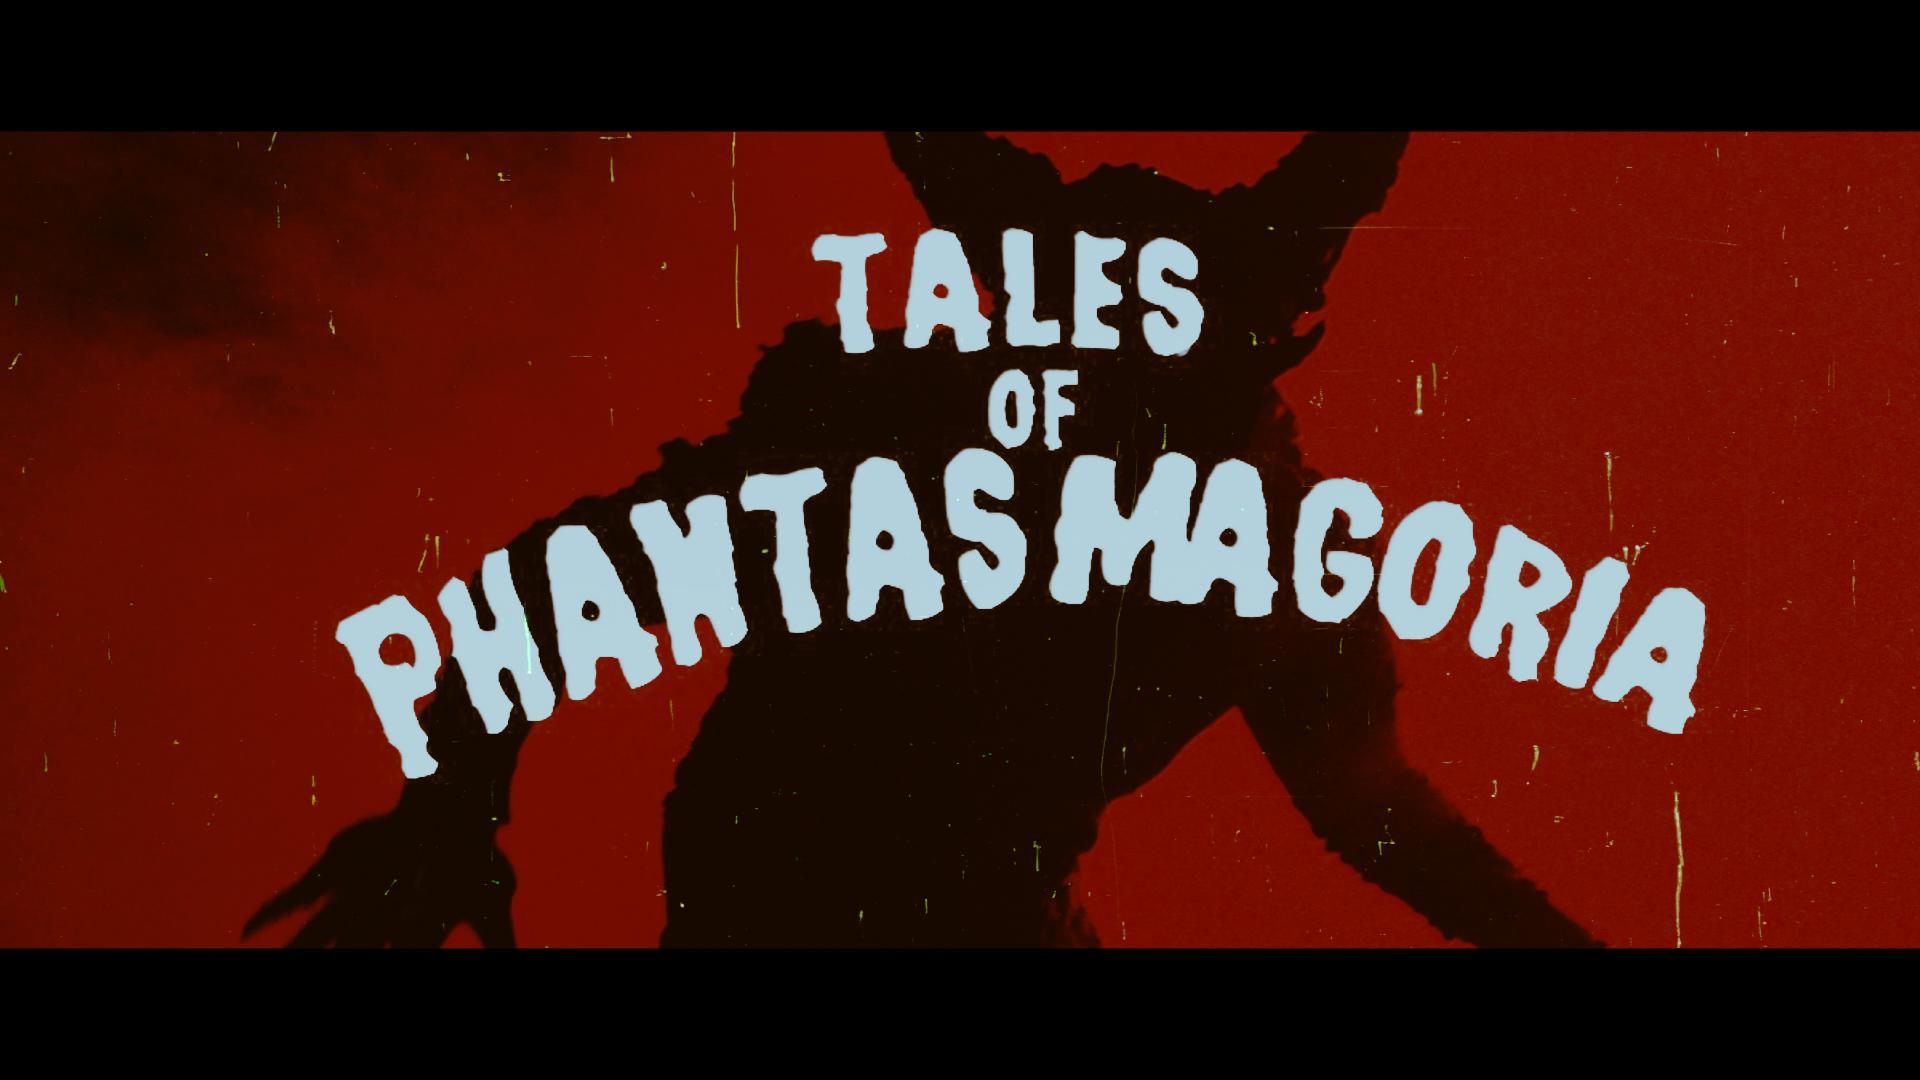 دانلود زیرنویس فارسی سریال Tales of Phantasmagoria